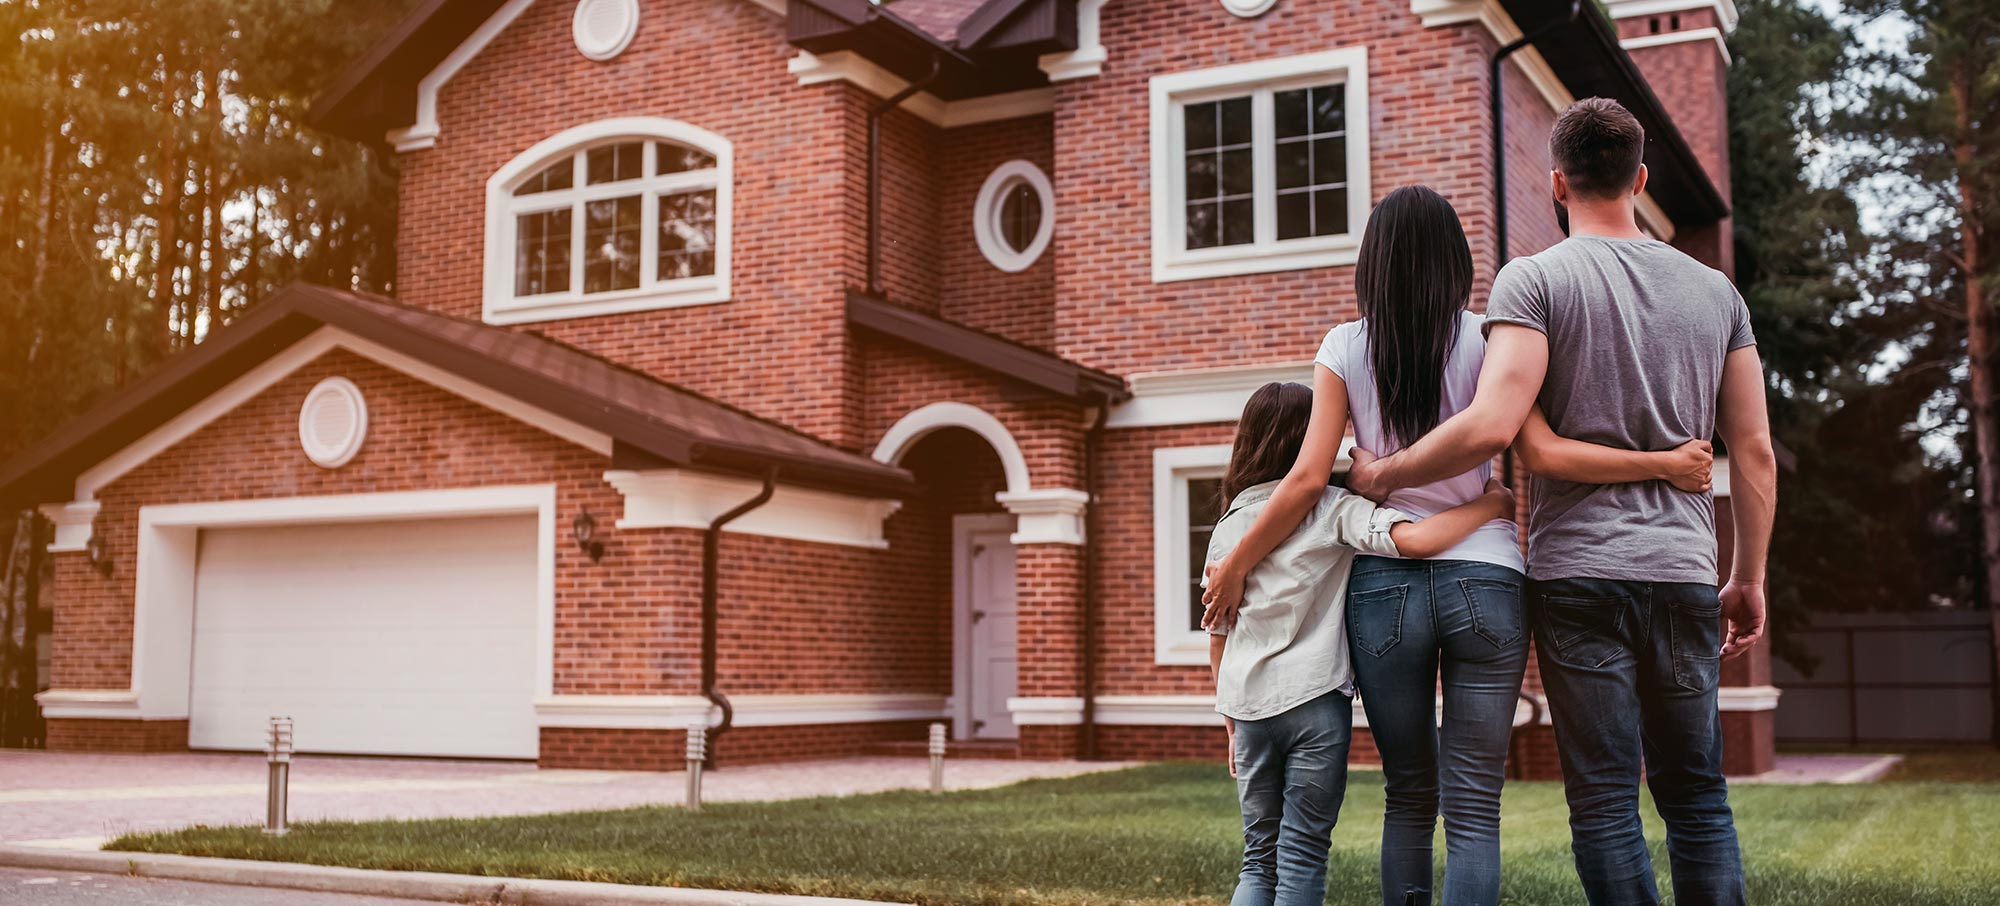 strohmeyer-law-texas-houston-estate-planning-5